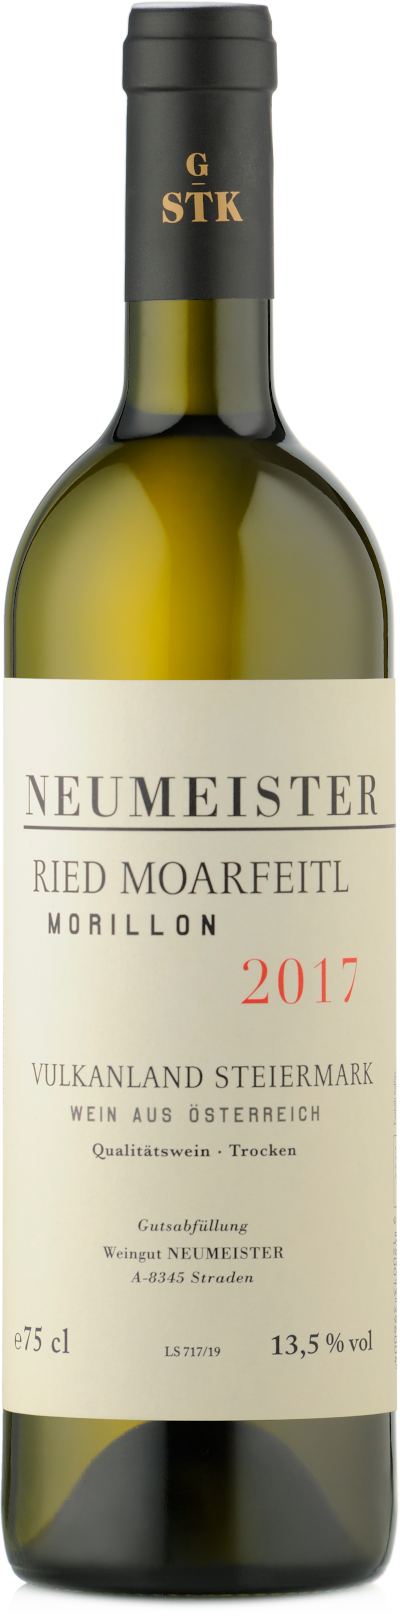 Neumeister - Morillon Ried Moarfeitl bio